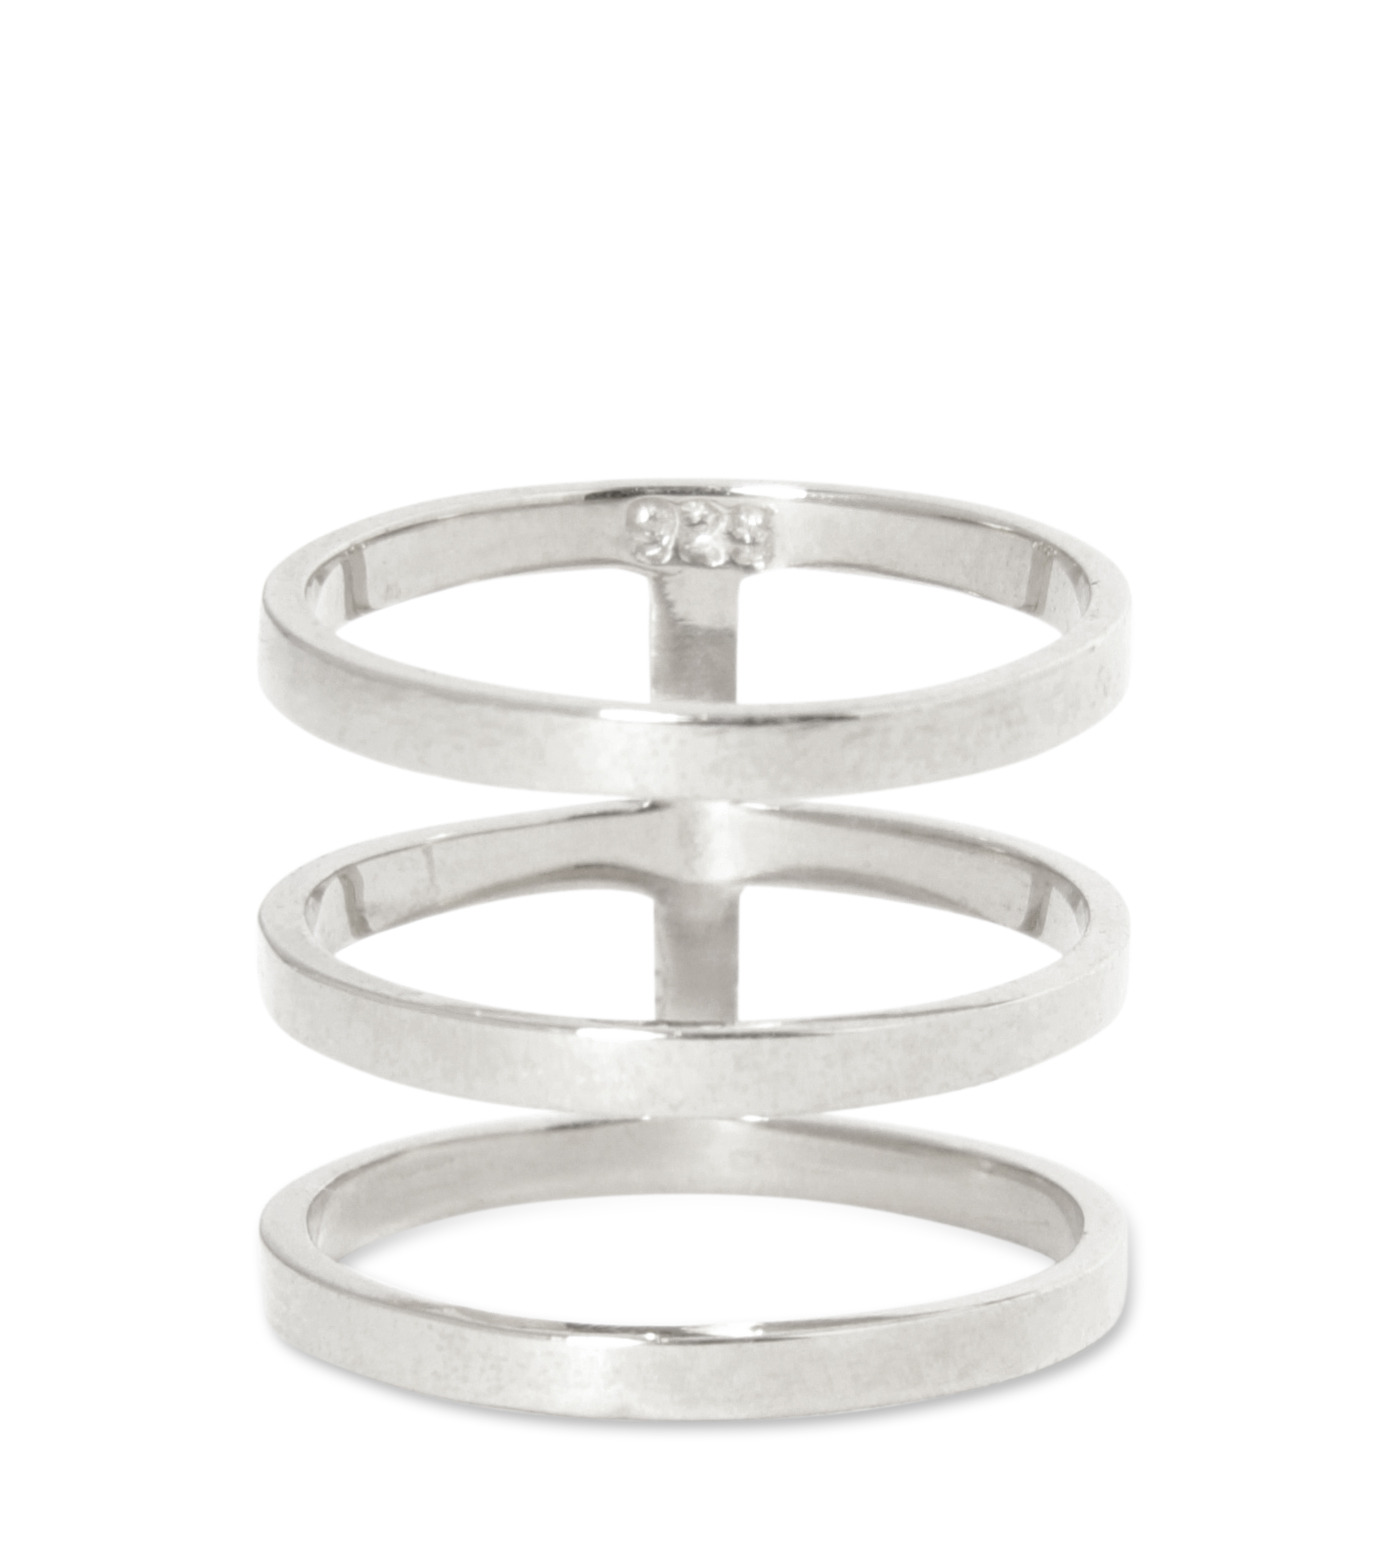 Campbell(キャンベル)のTribar Ring-SILVER(アクセサリー/accessory)-FW13R05-1 拡大詳細画像1